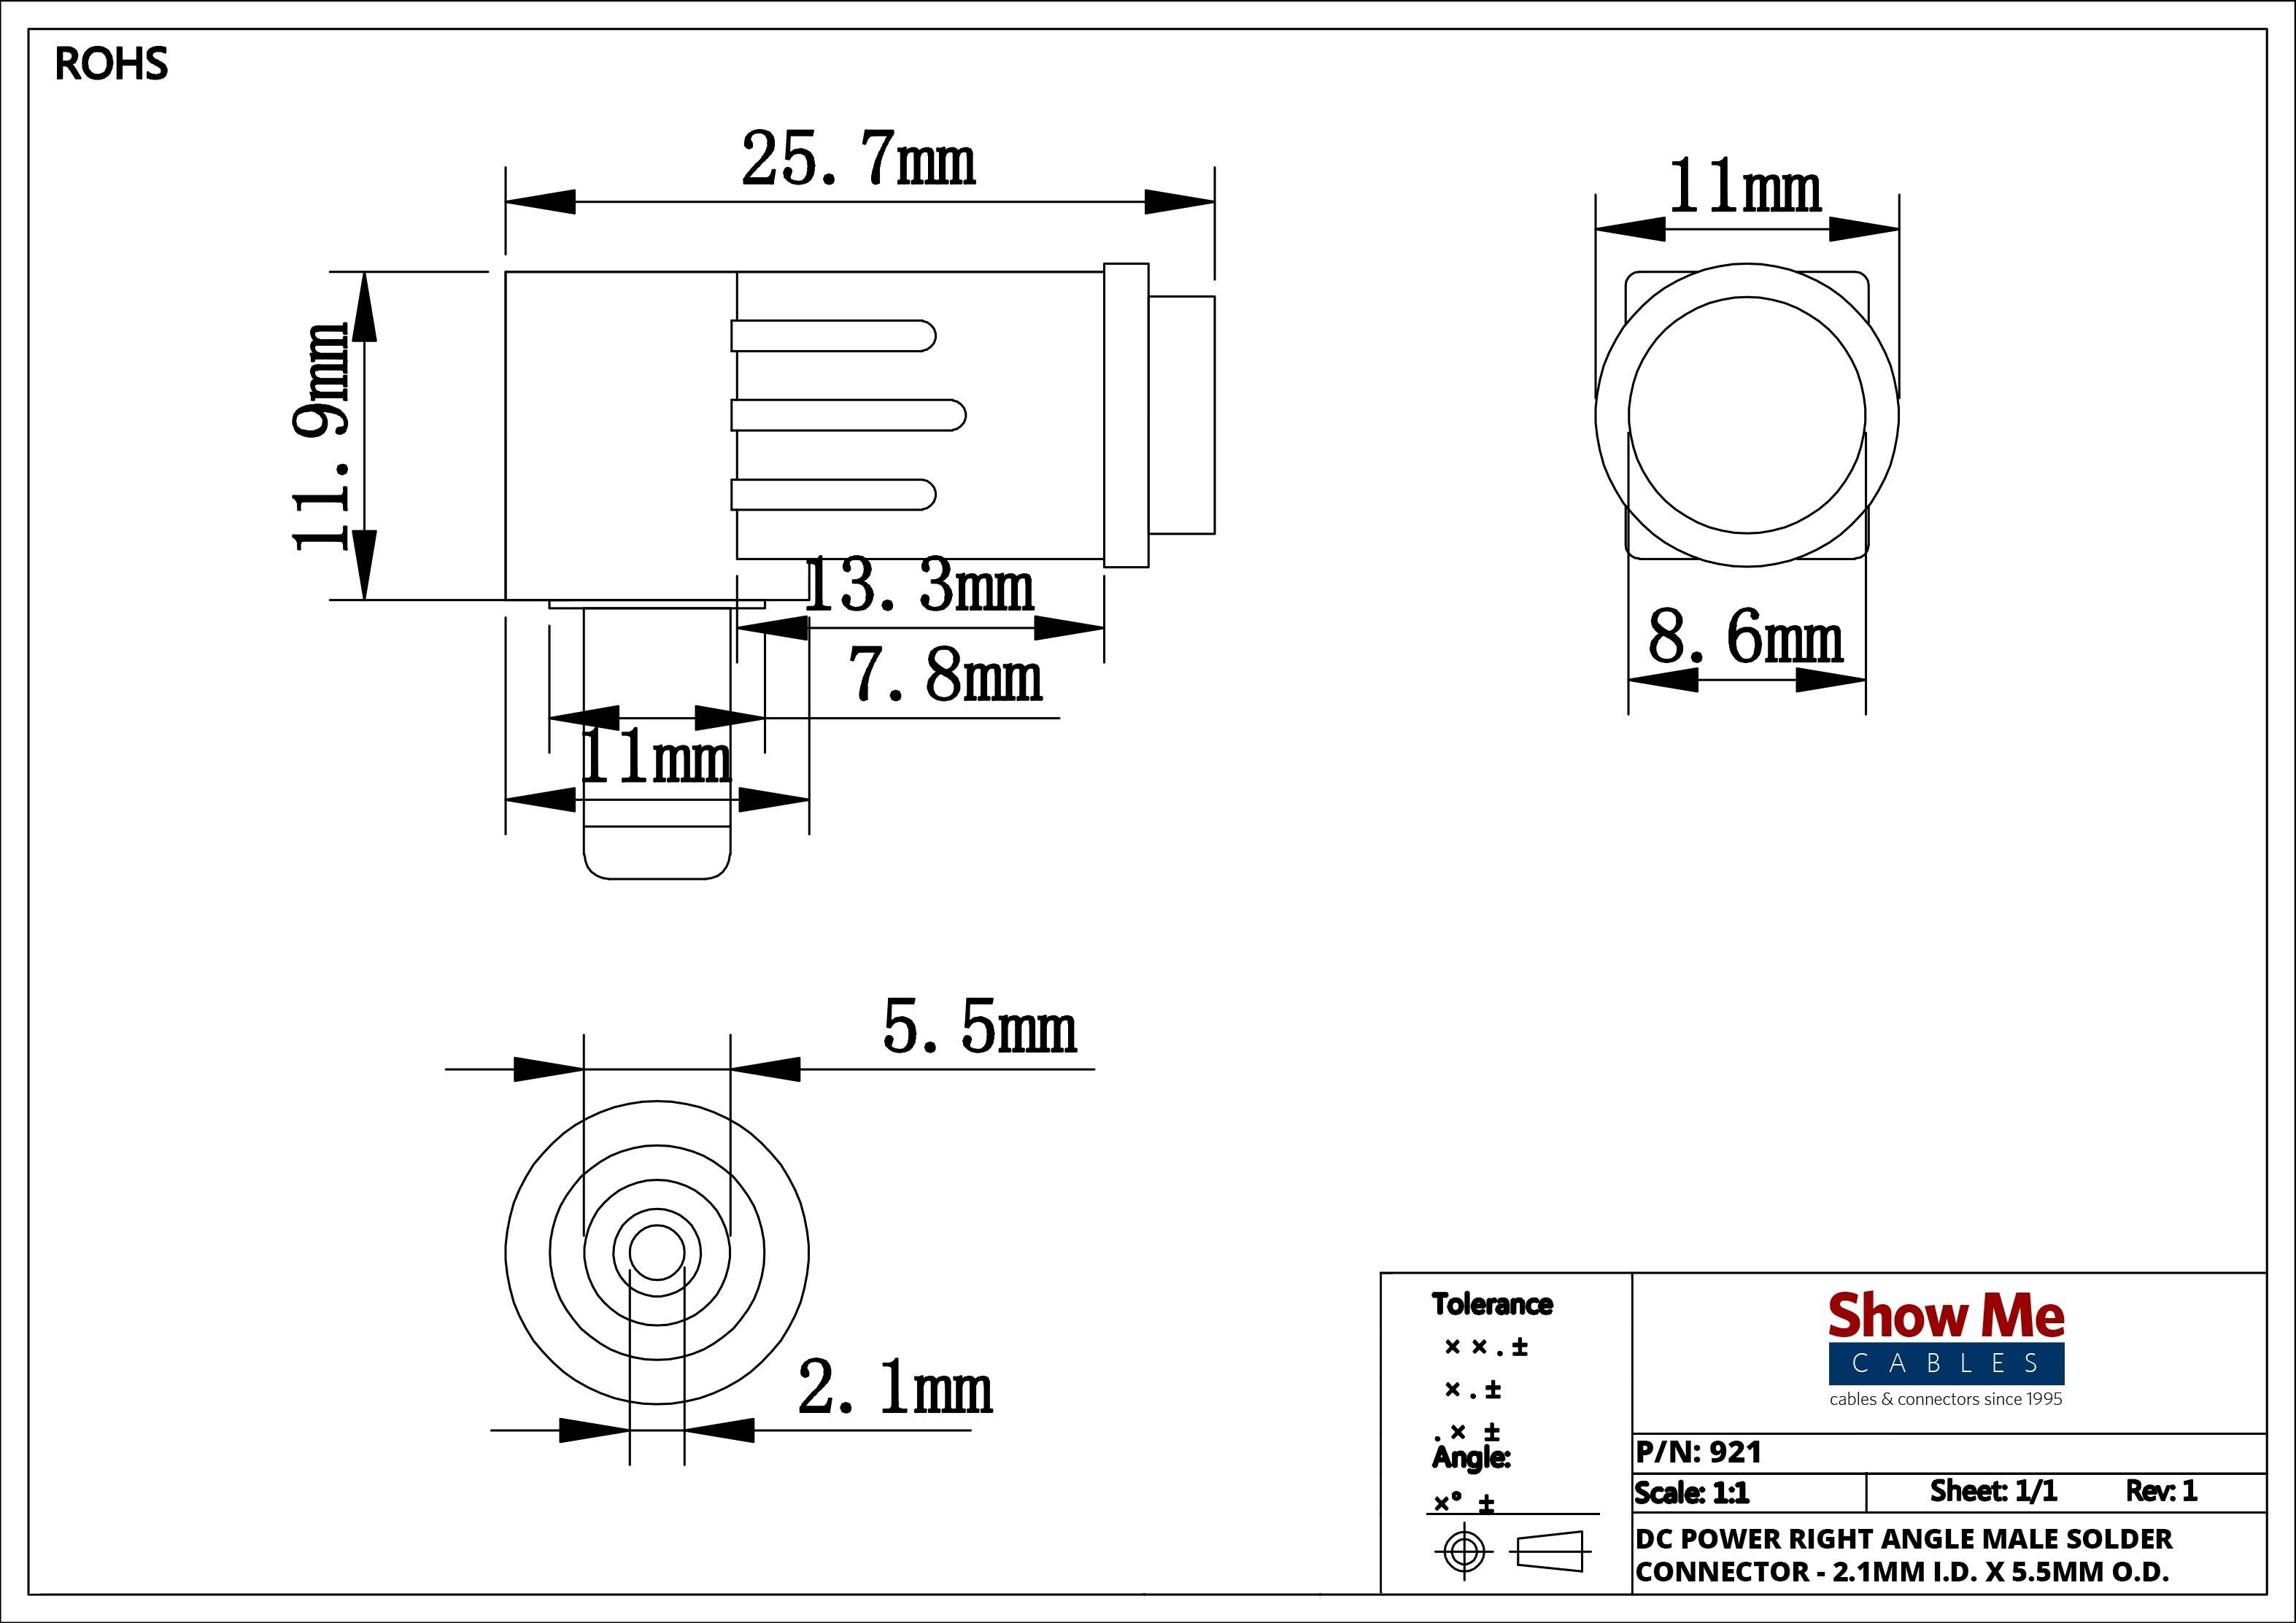 pole building wiring diagram schematic diagram download rh f3mta34b 101drivers info